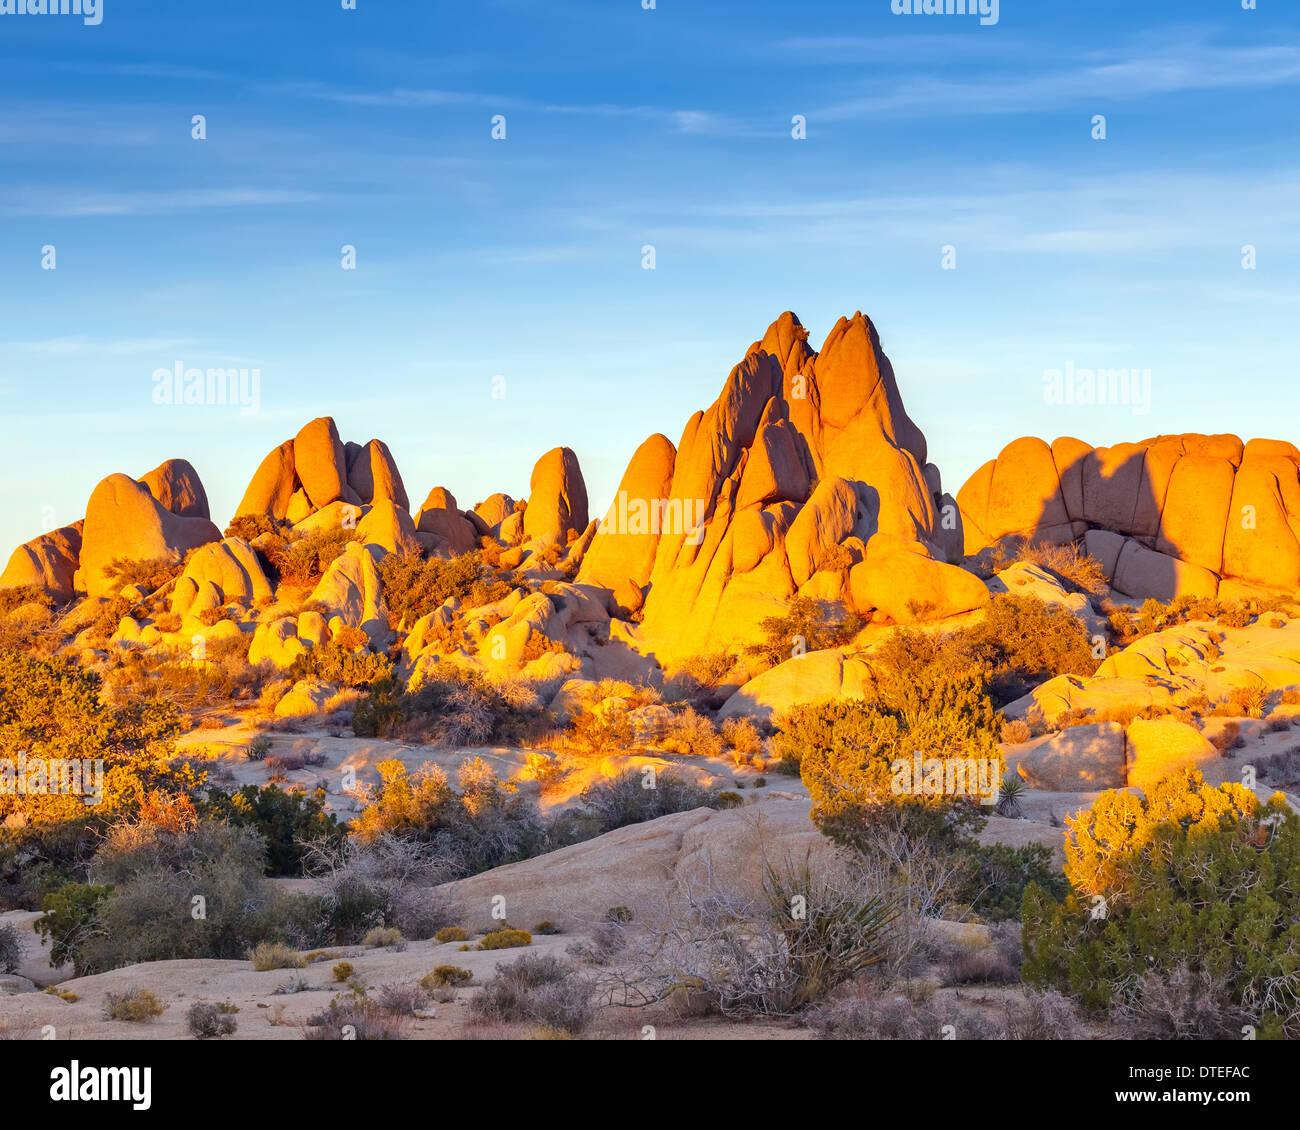 Rocks in Joshua Tree National Park - Stock Image